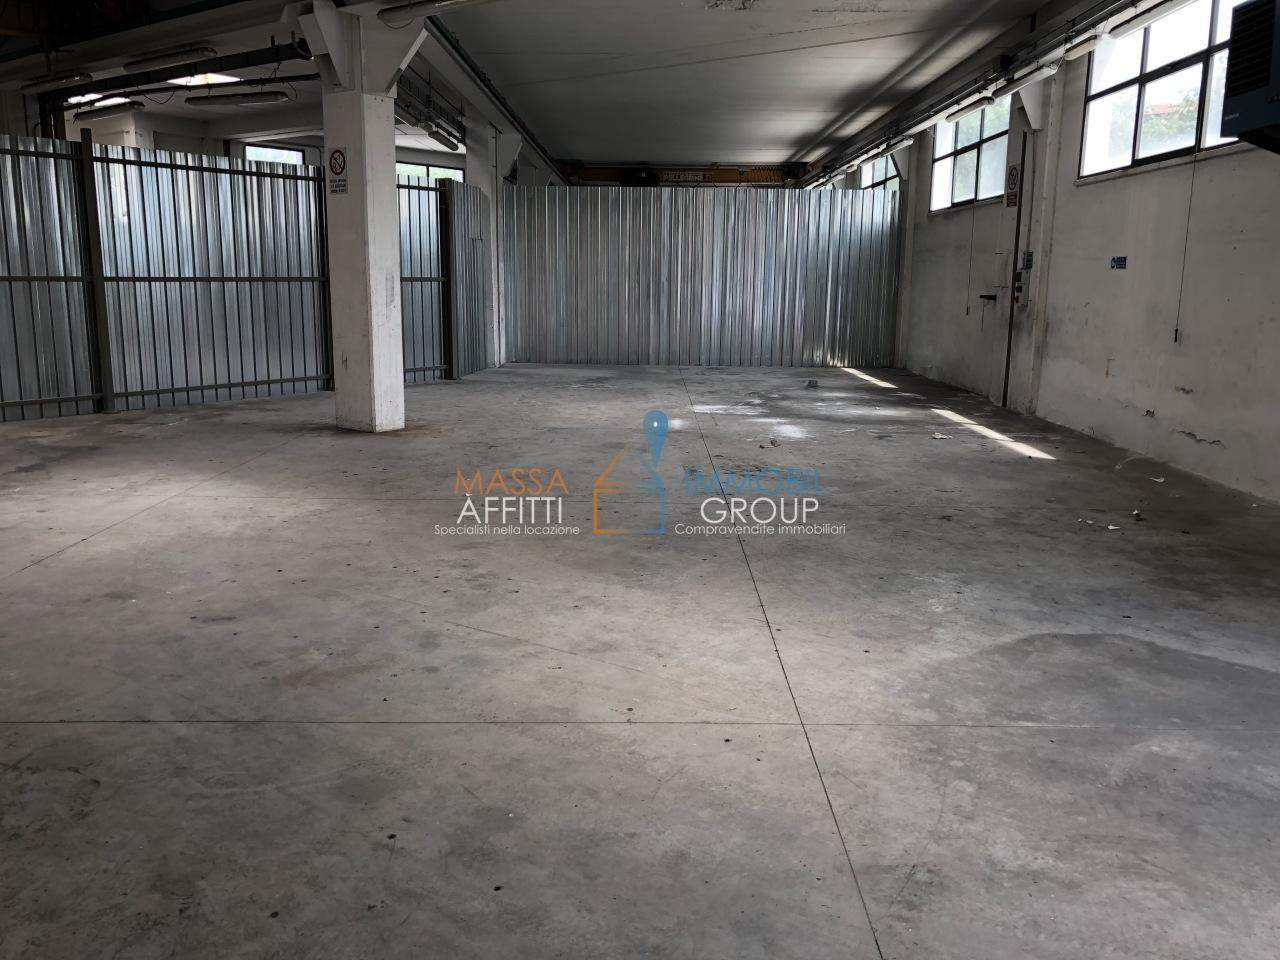 Capannone / Fondo - Industriale/Artigianale a Avenza, Carrara